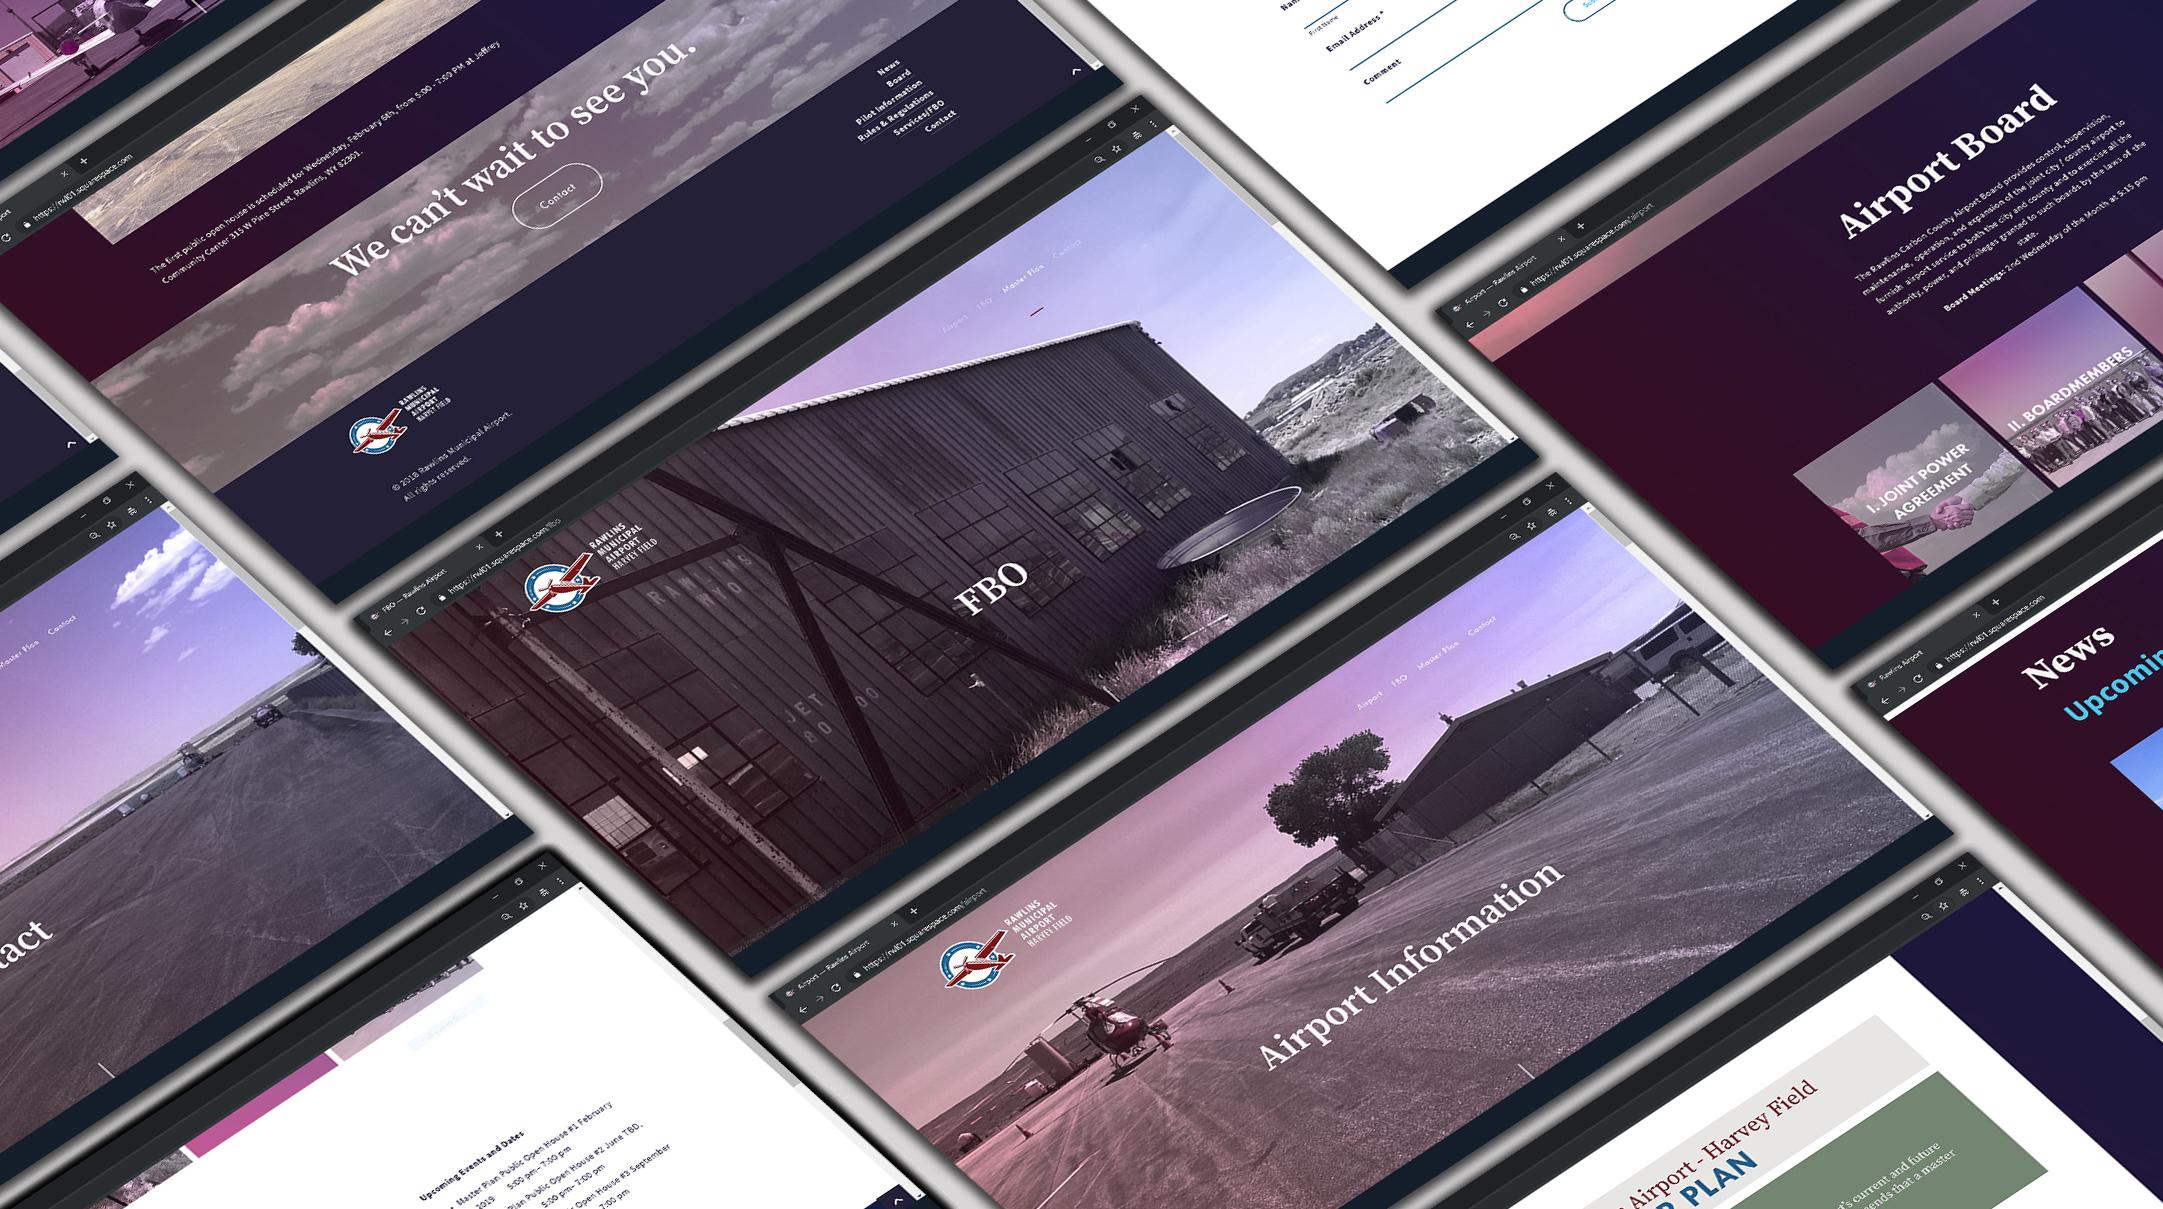 RWL - Desktop Mockup - 2.0.jpg